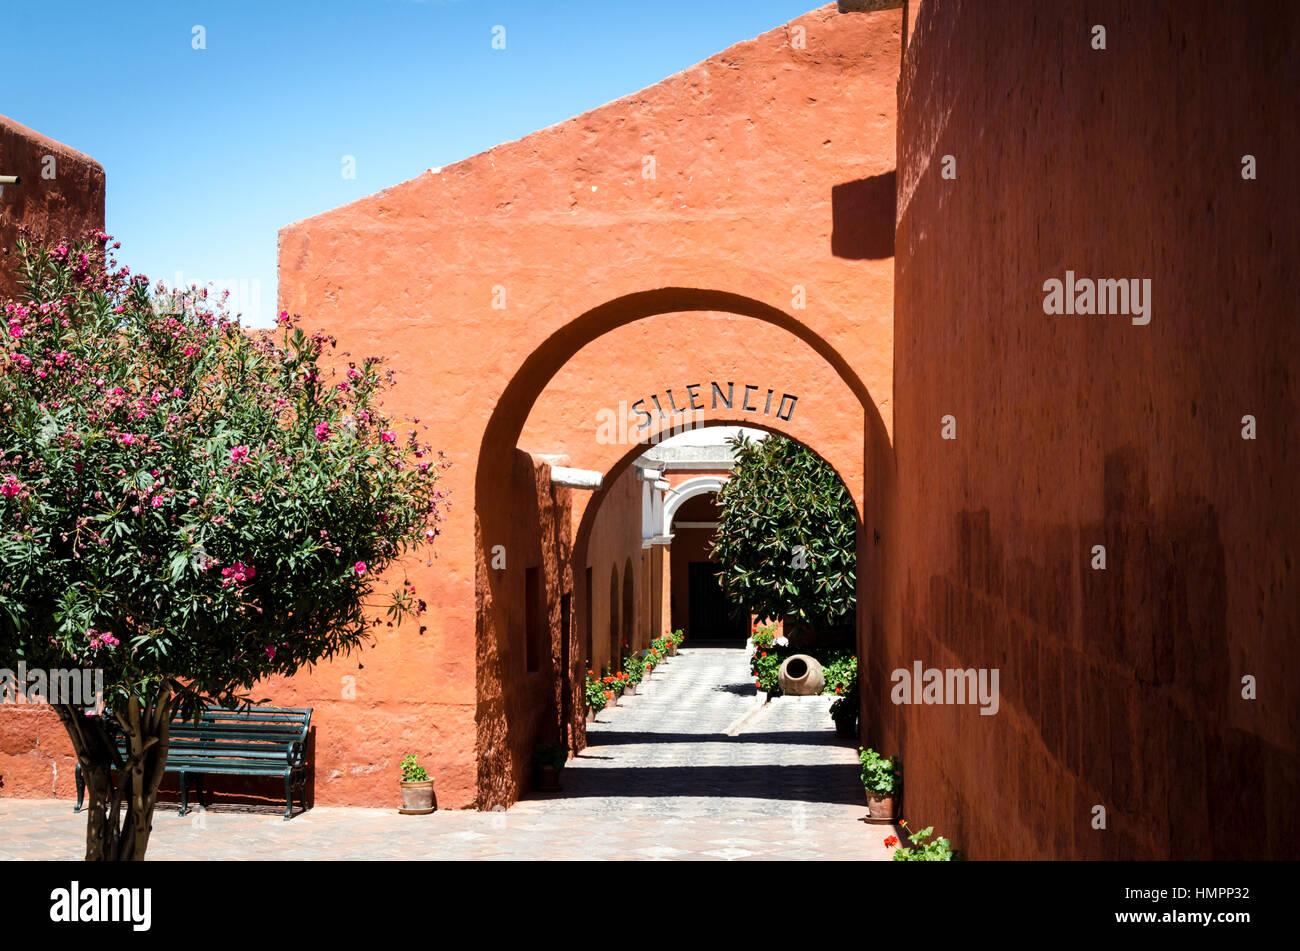 Convento de Santa Catalina, monumento barroco colonial en Arequipa (siglo XVI), en piedra sillar (volcánica). - Stock Image